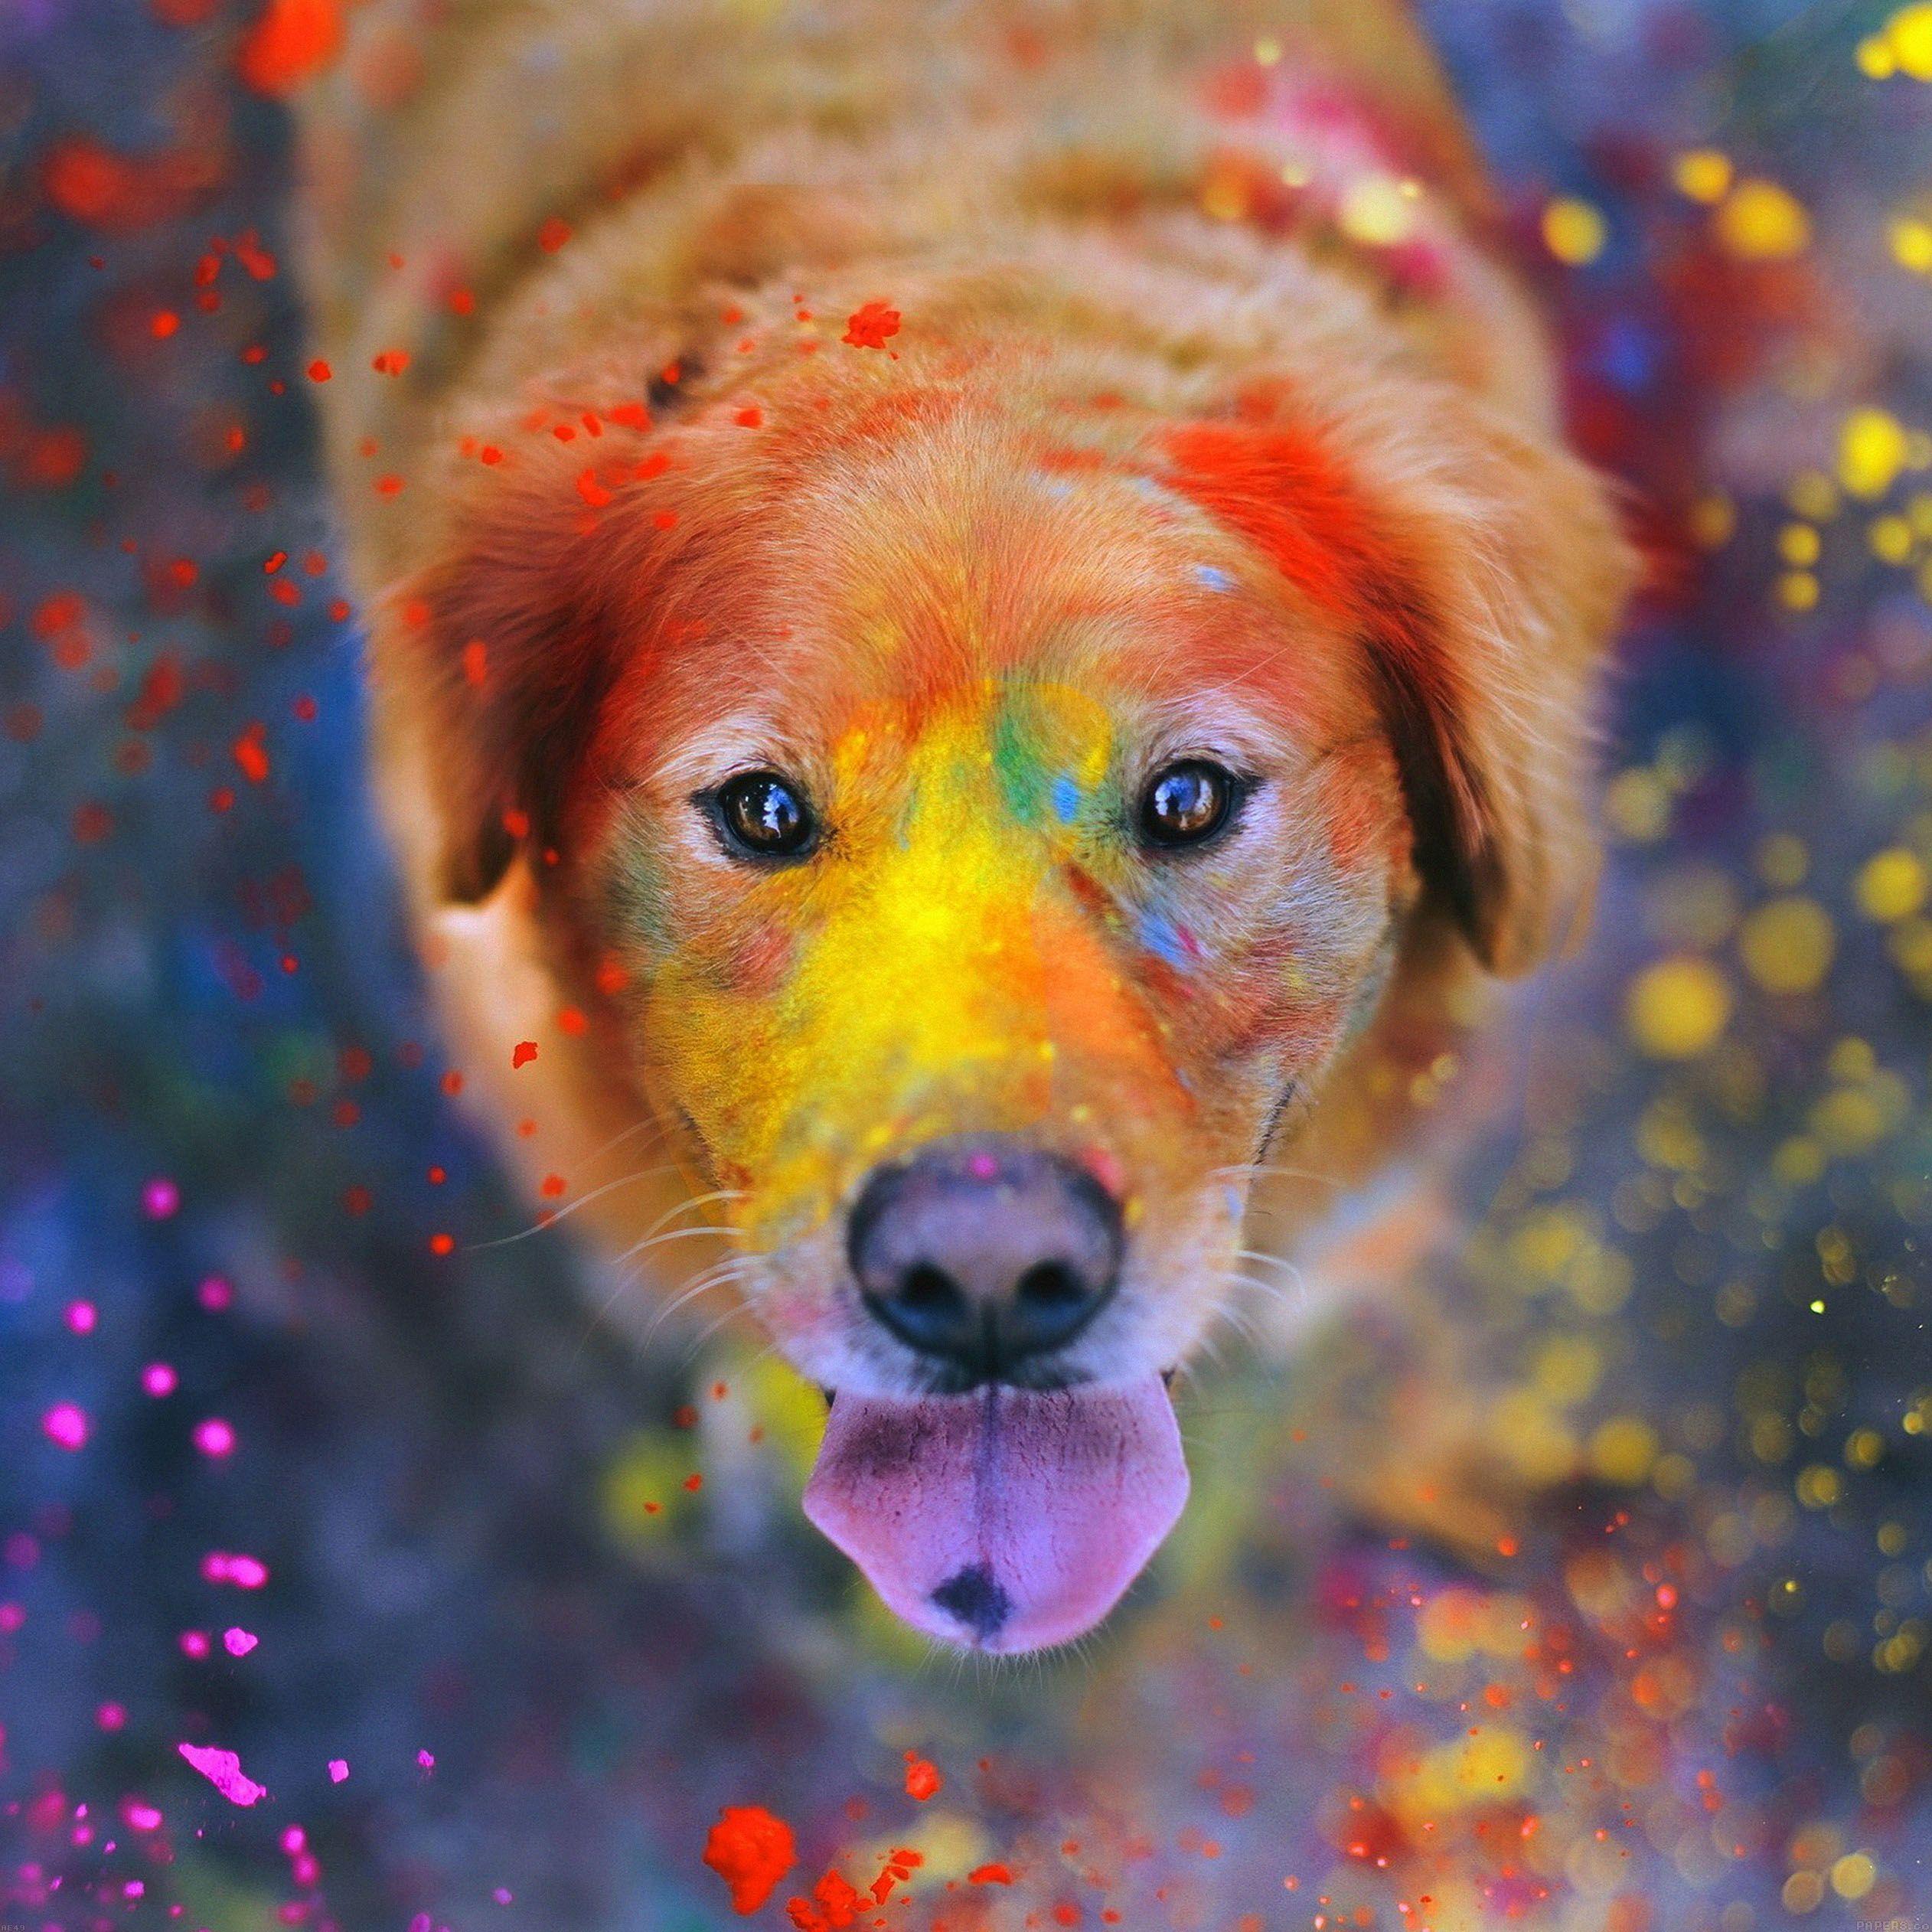 wallpaper hd retina chats chiens apple iphone